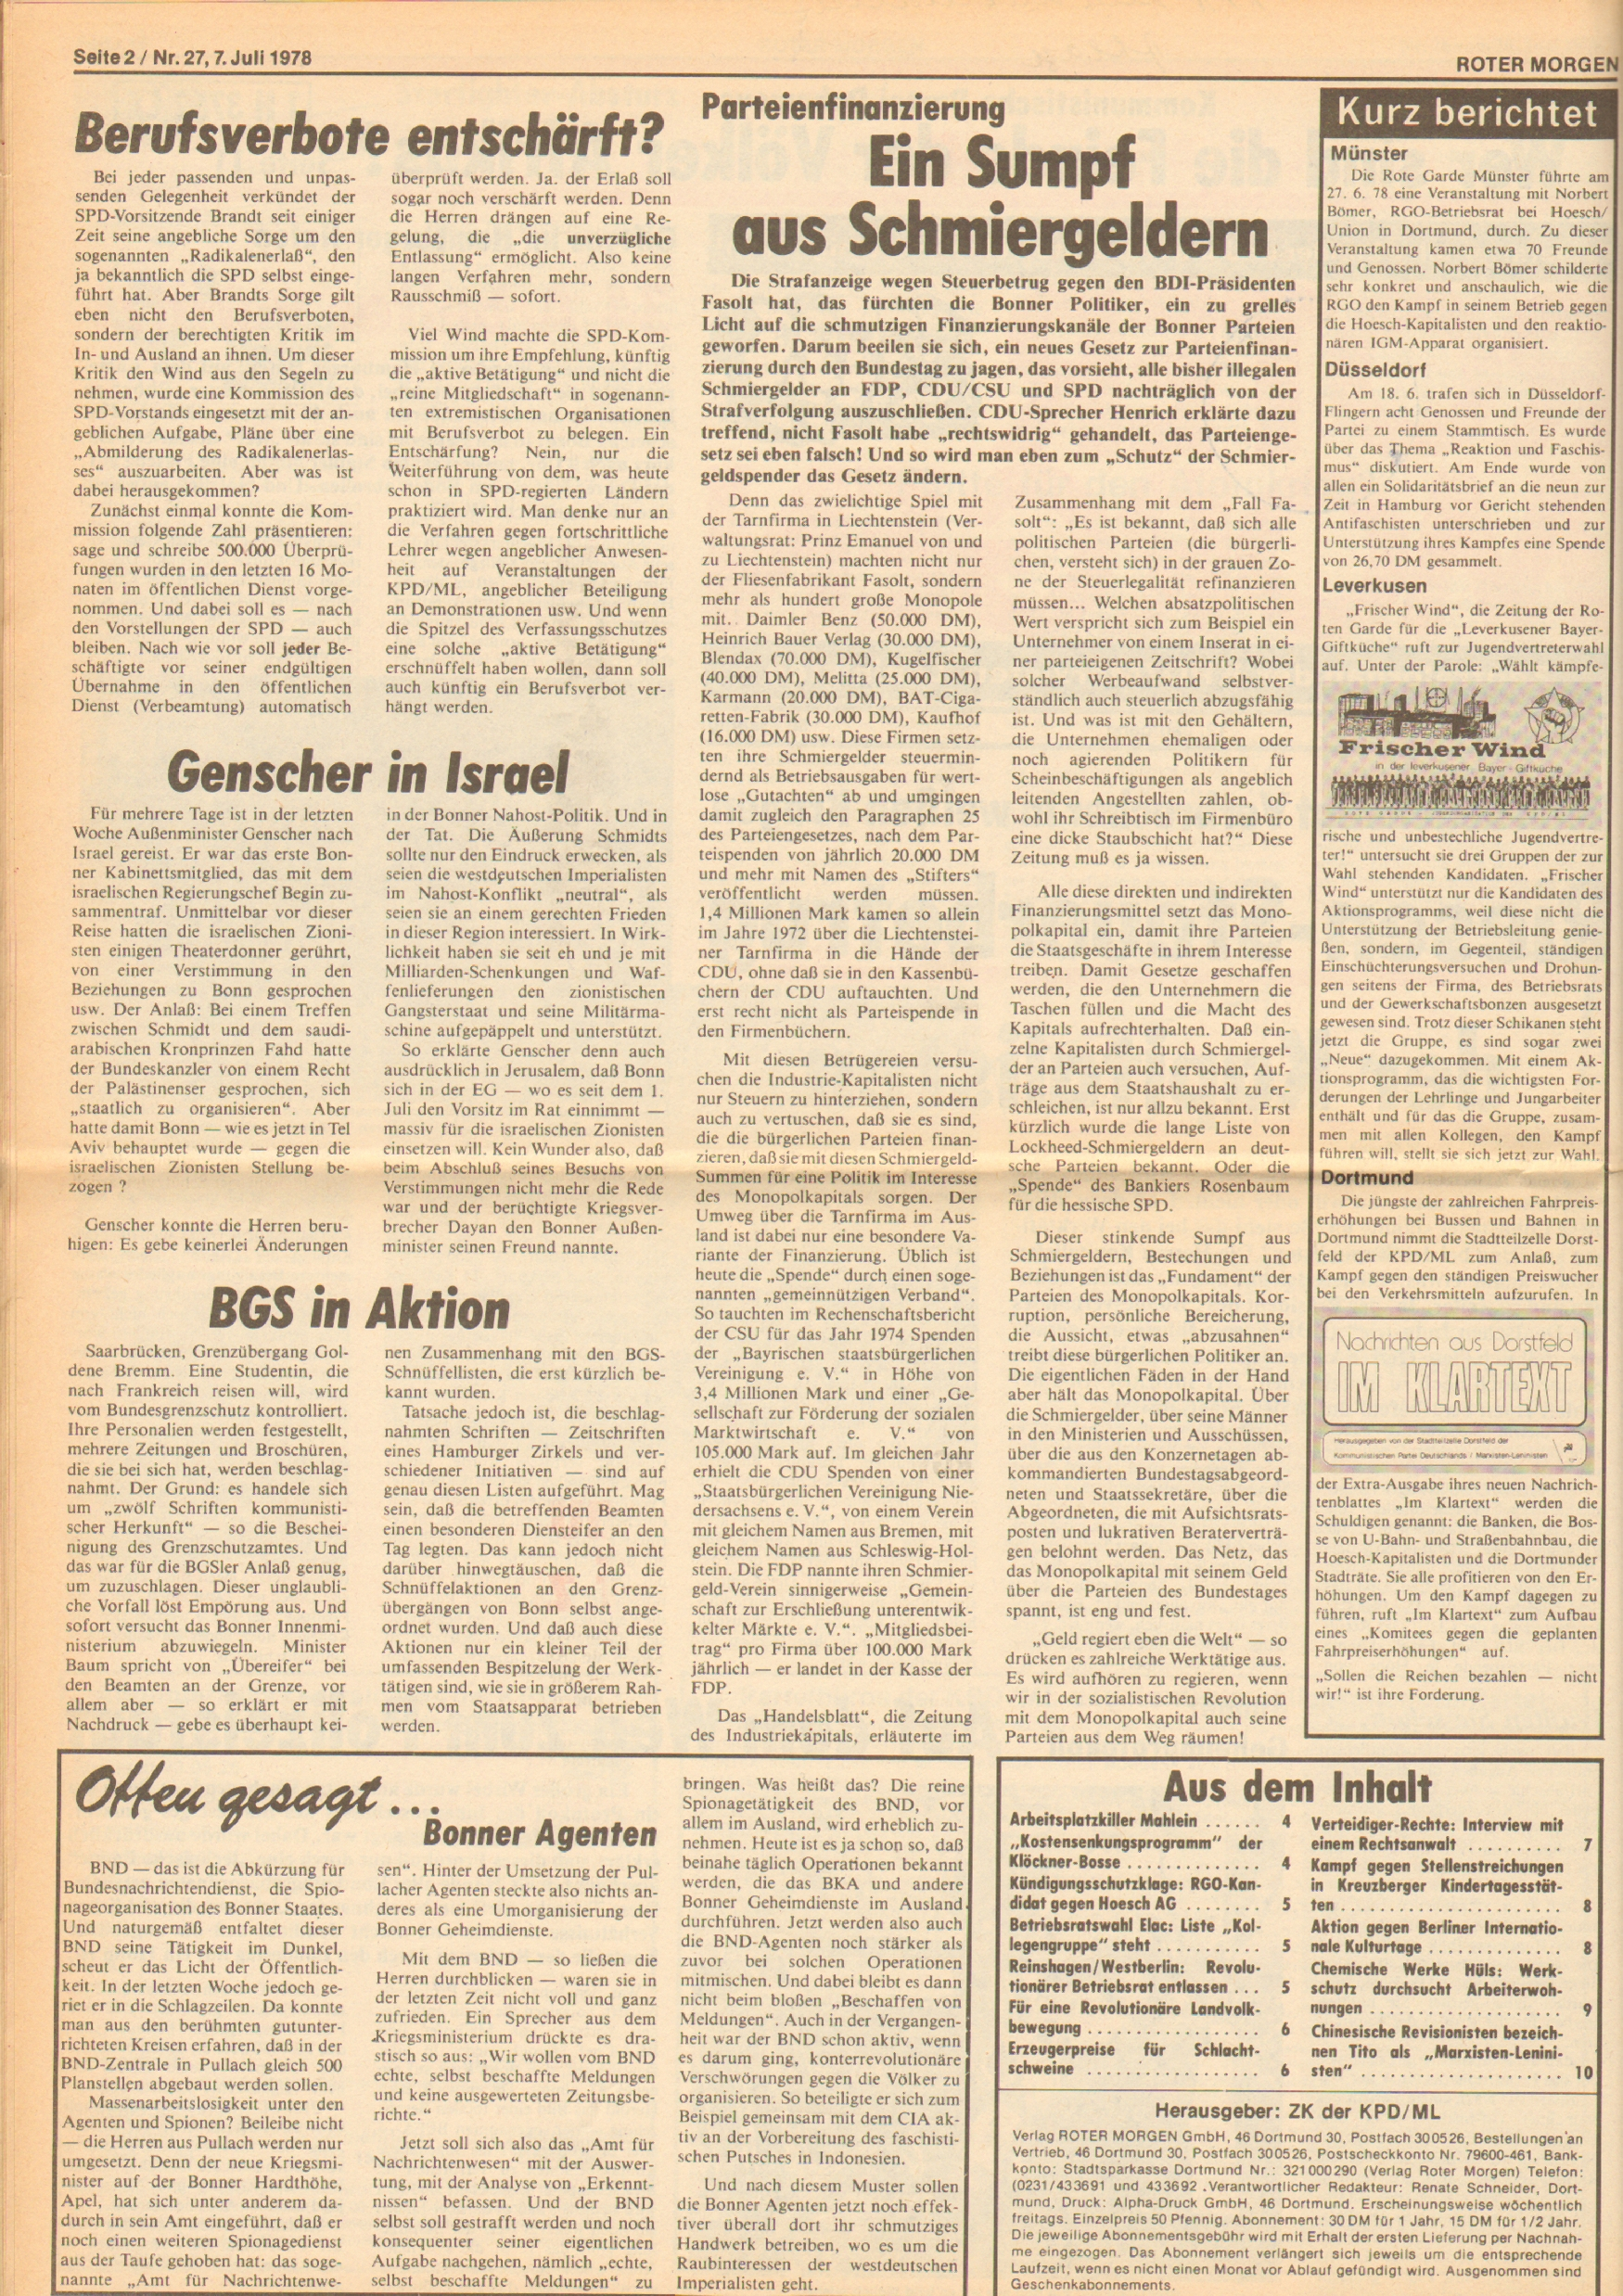 Roter Morgen, 12. Jg., 7. Juli 1978, Nr. 27, Seite 2